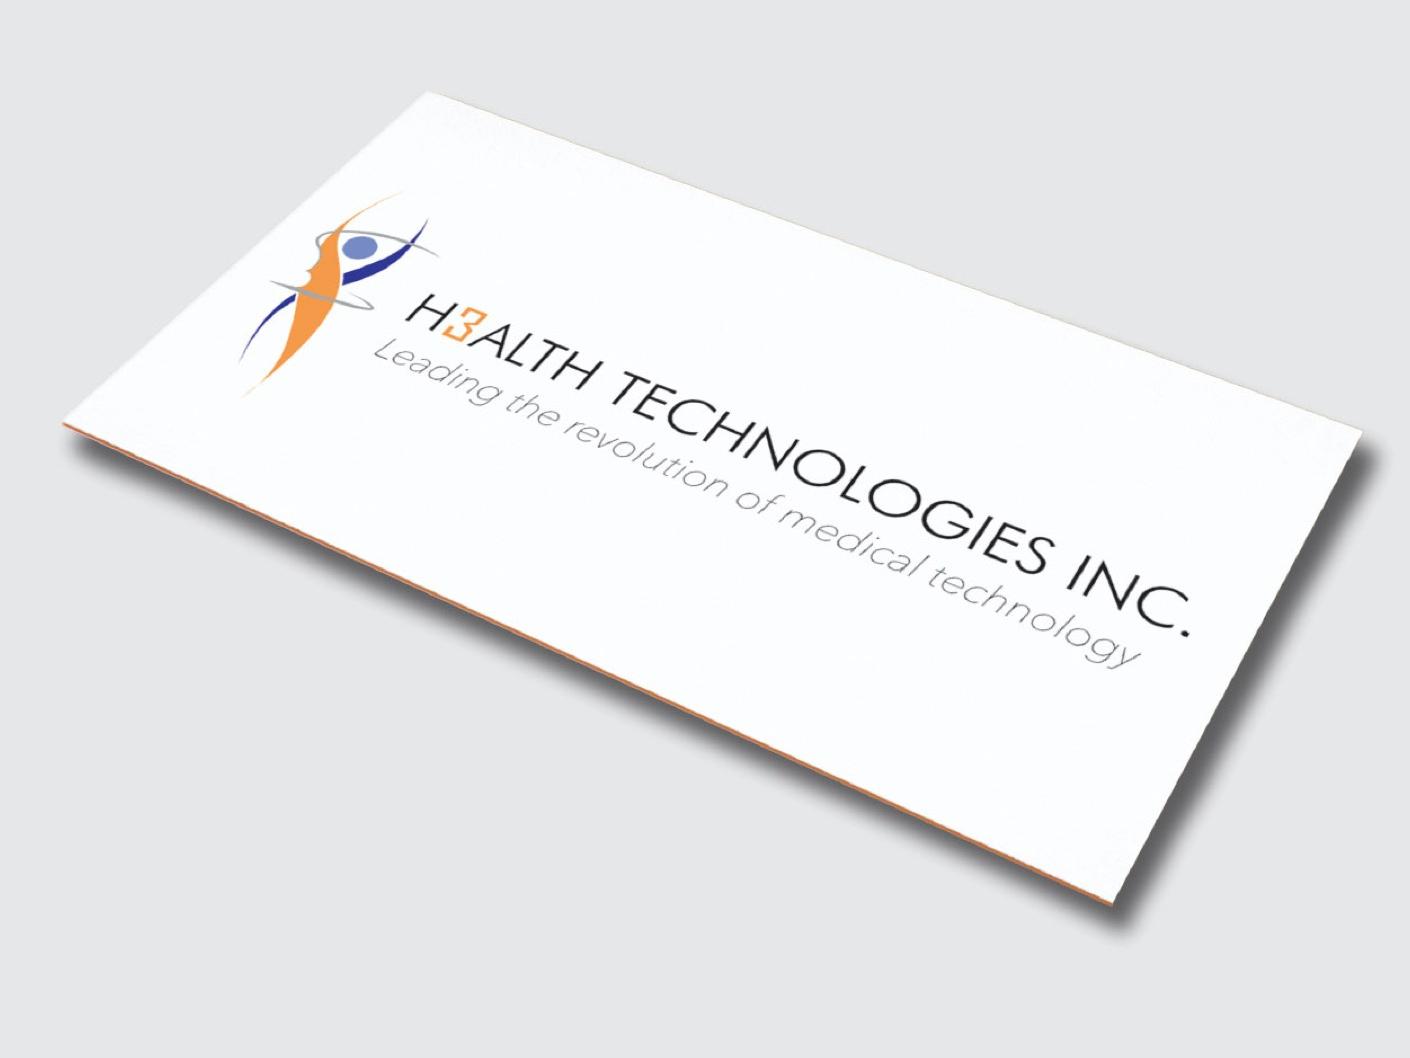 H3alth Technologies